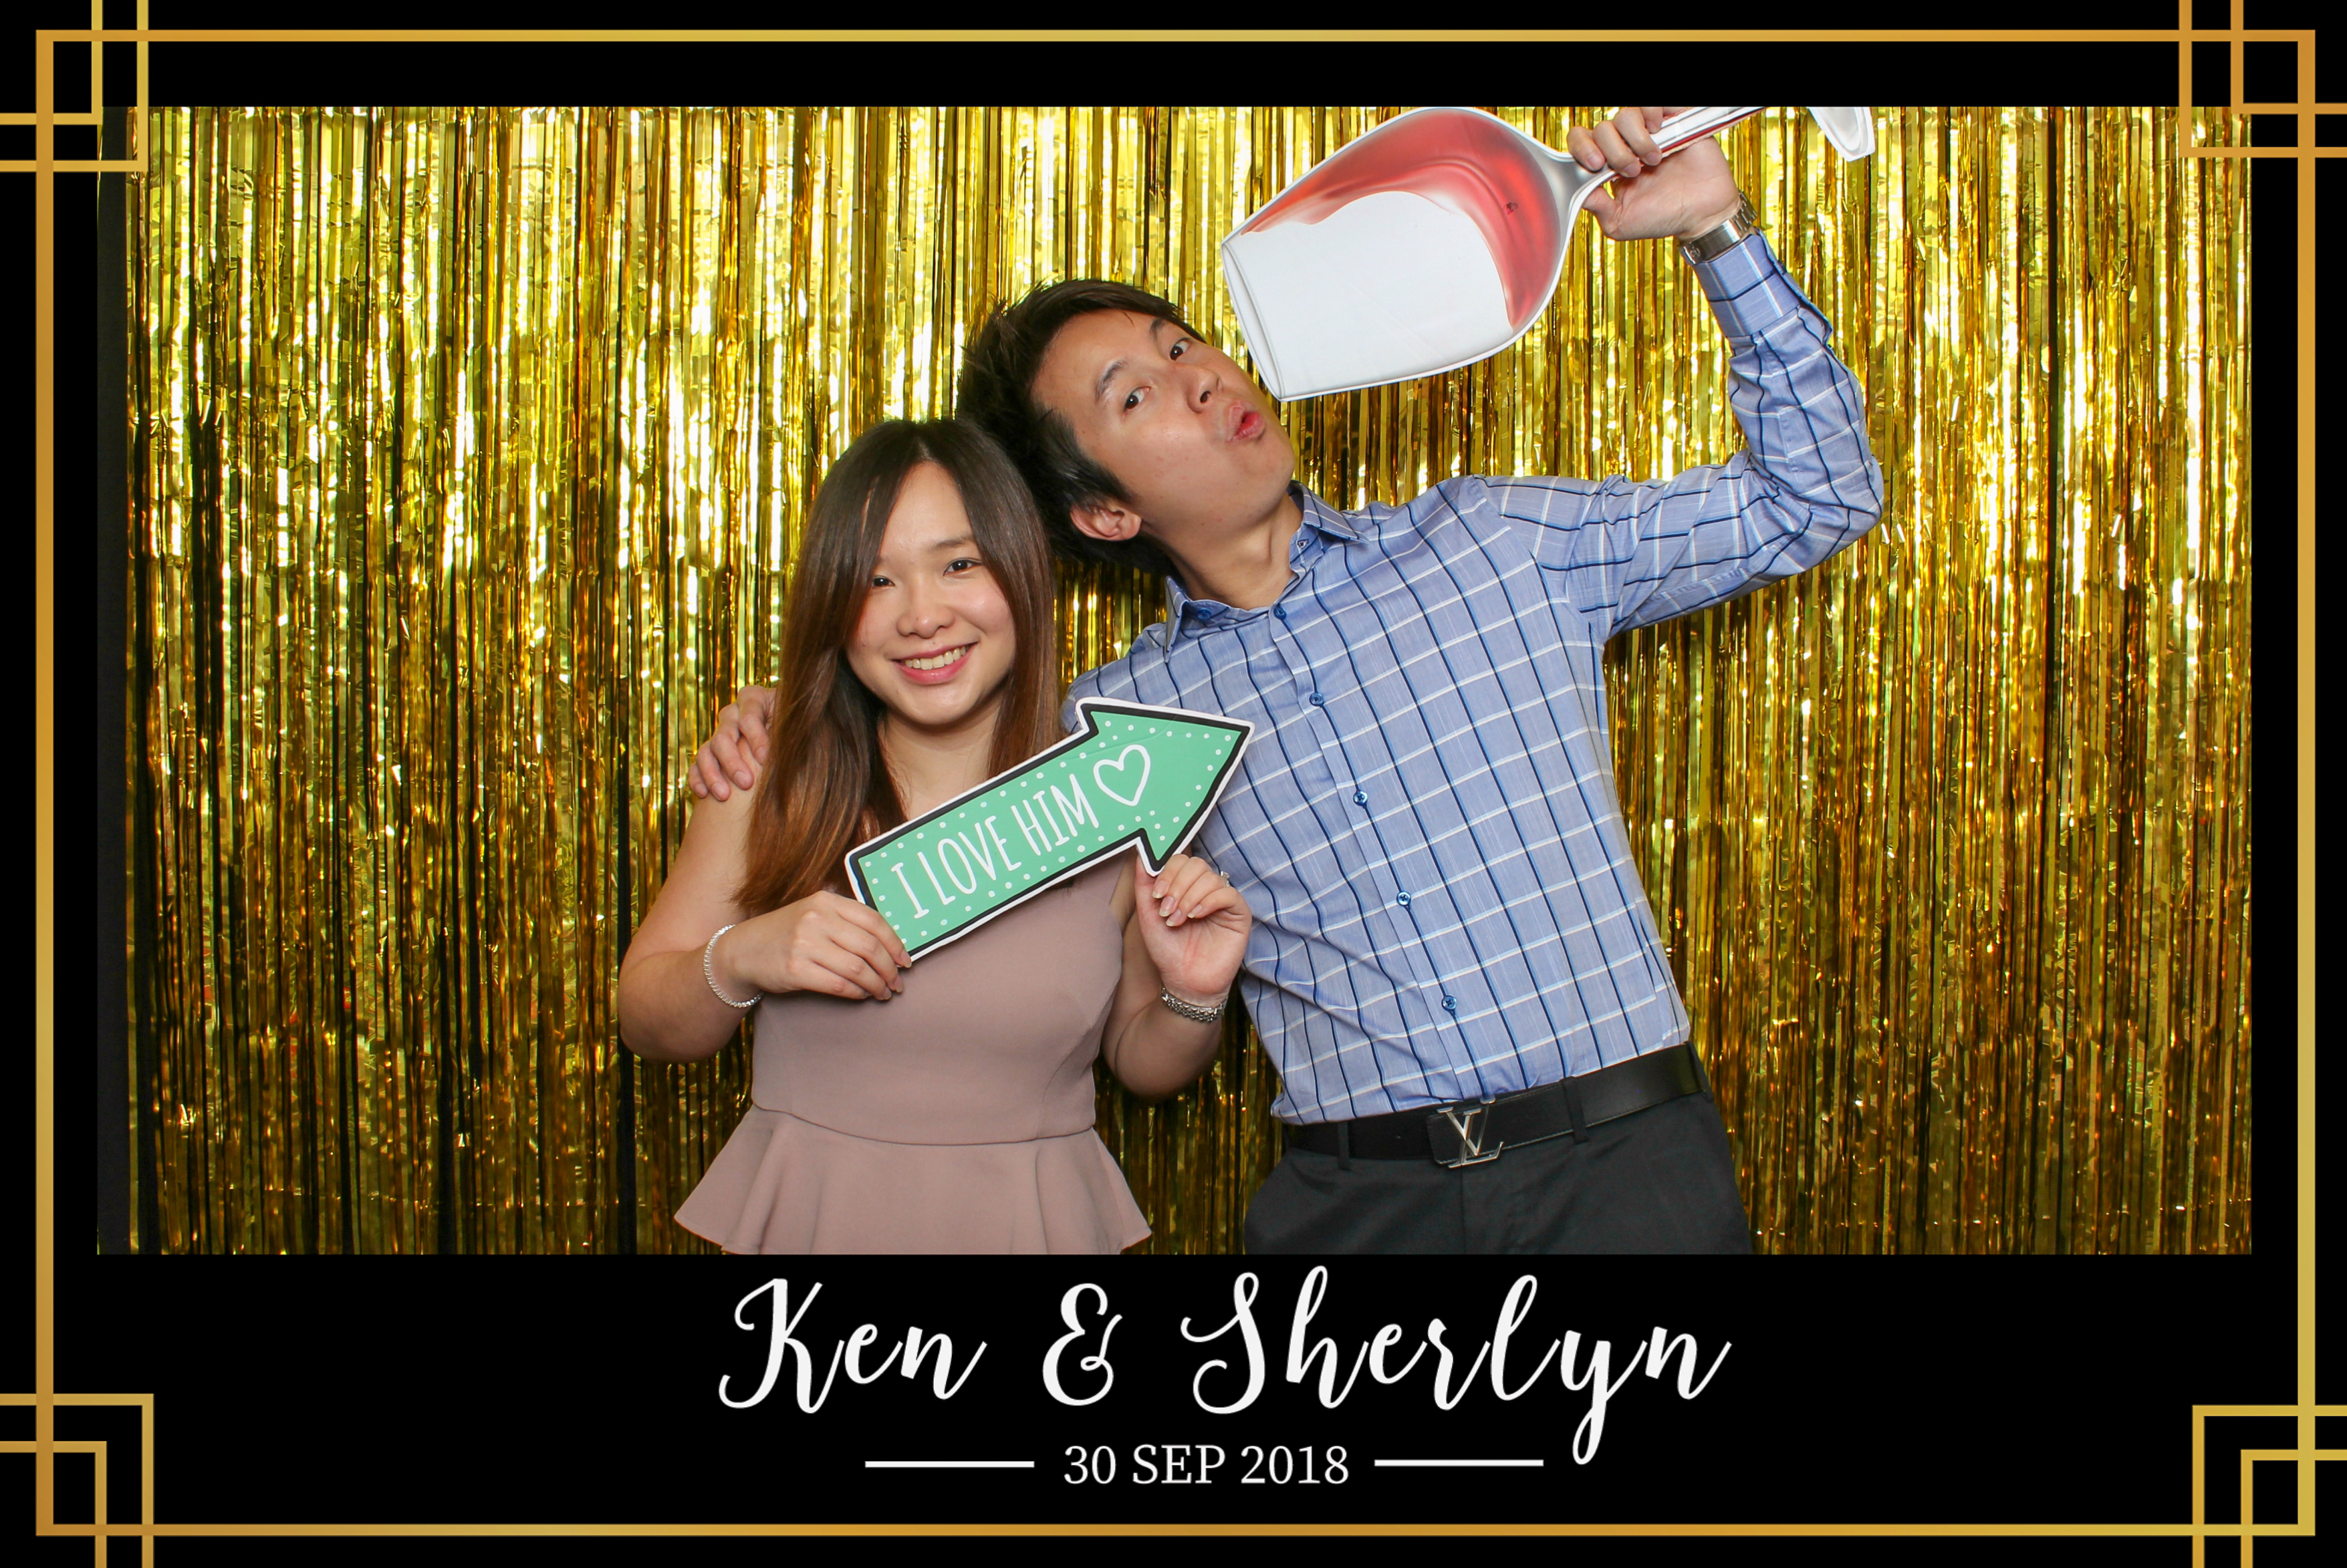 Ken Sherlyn wedding photo booth (21)